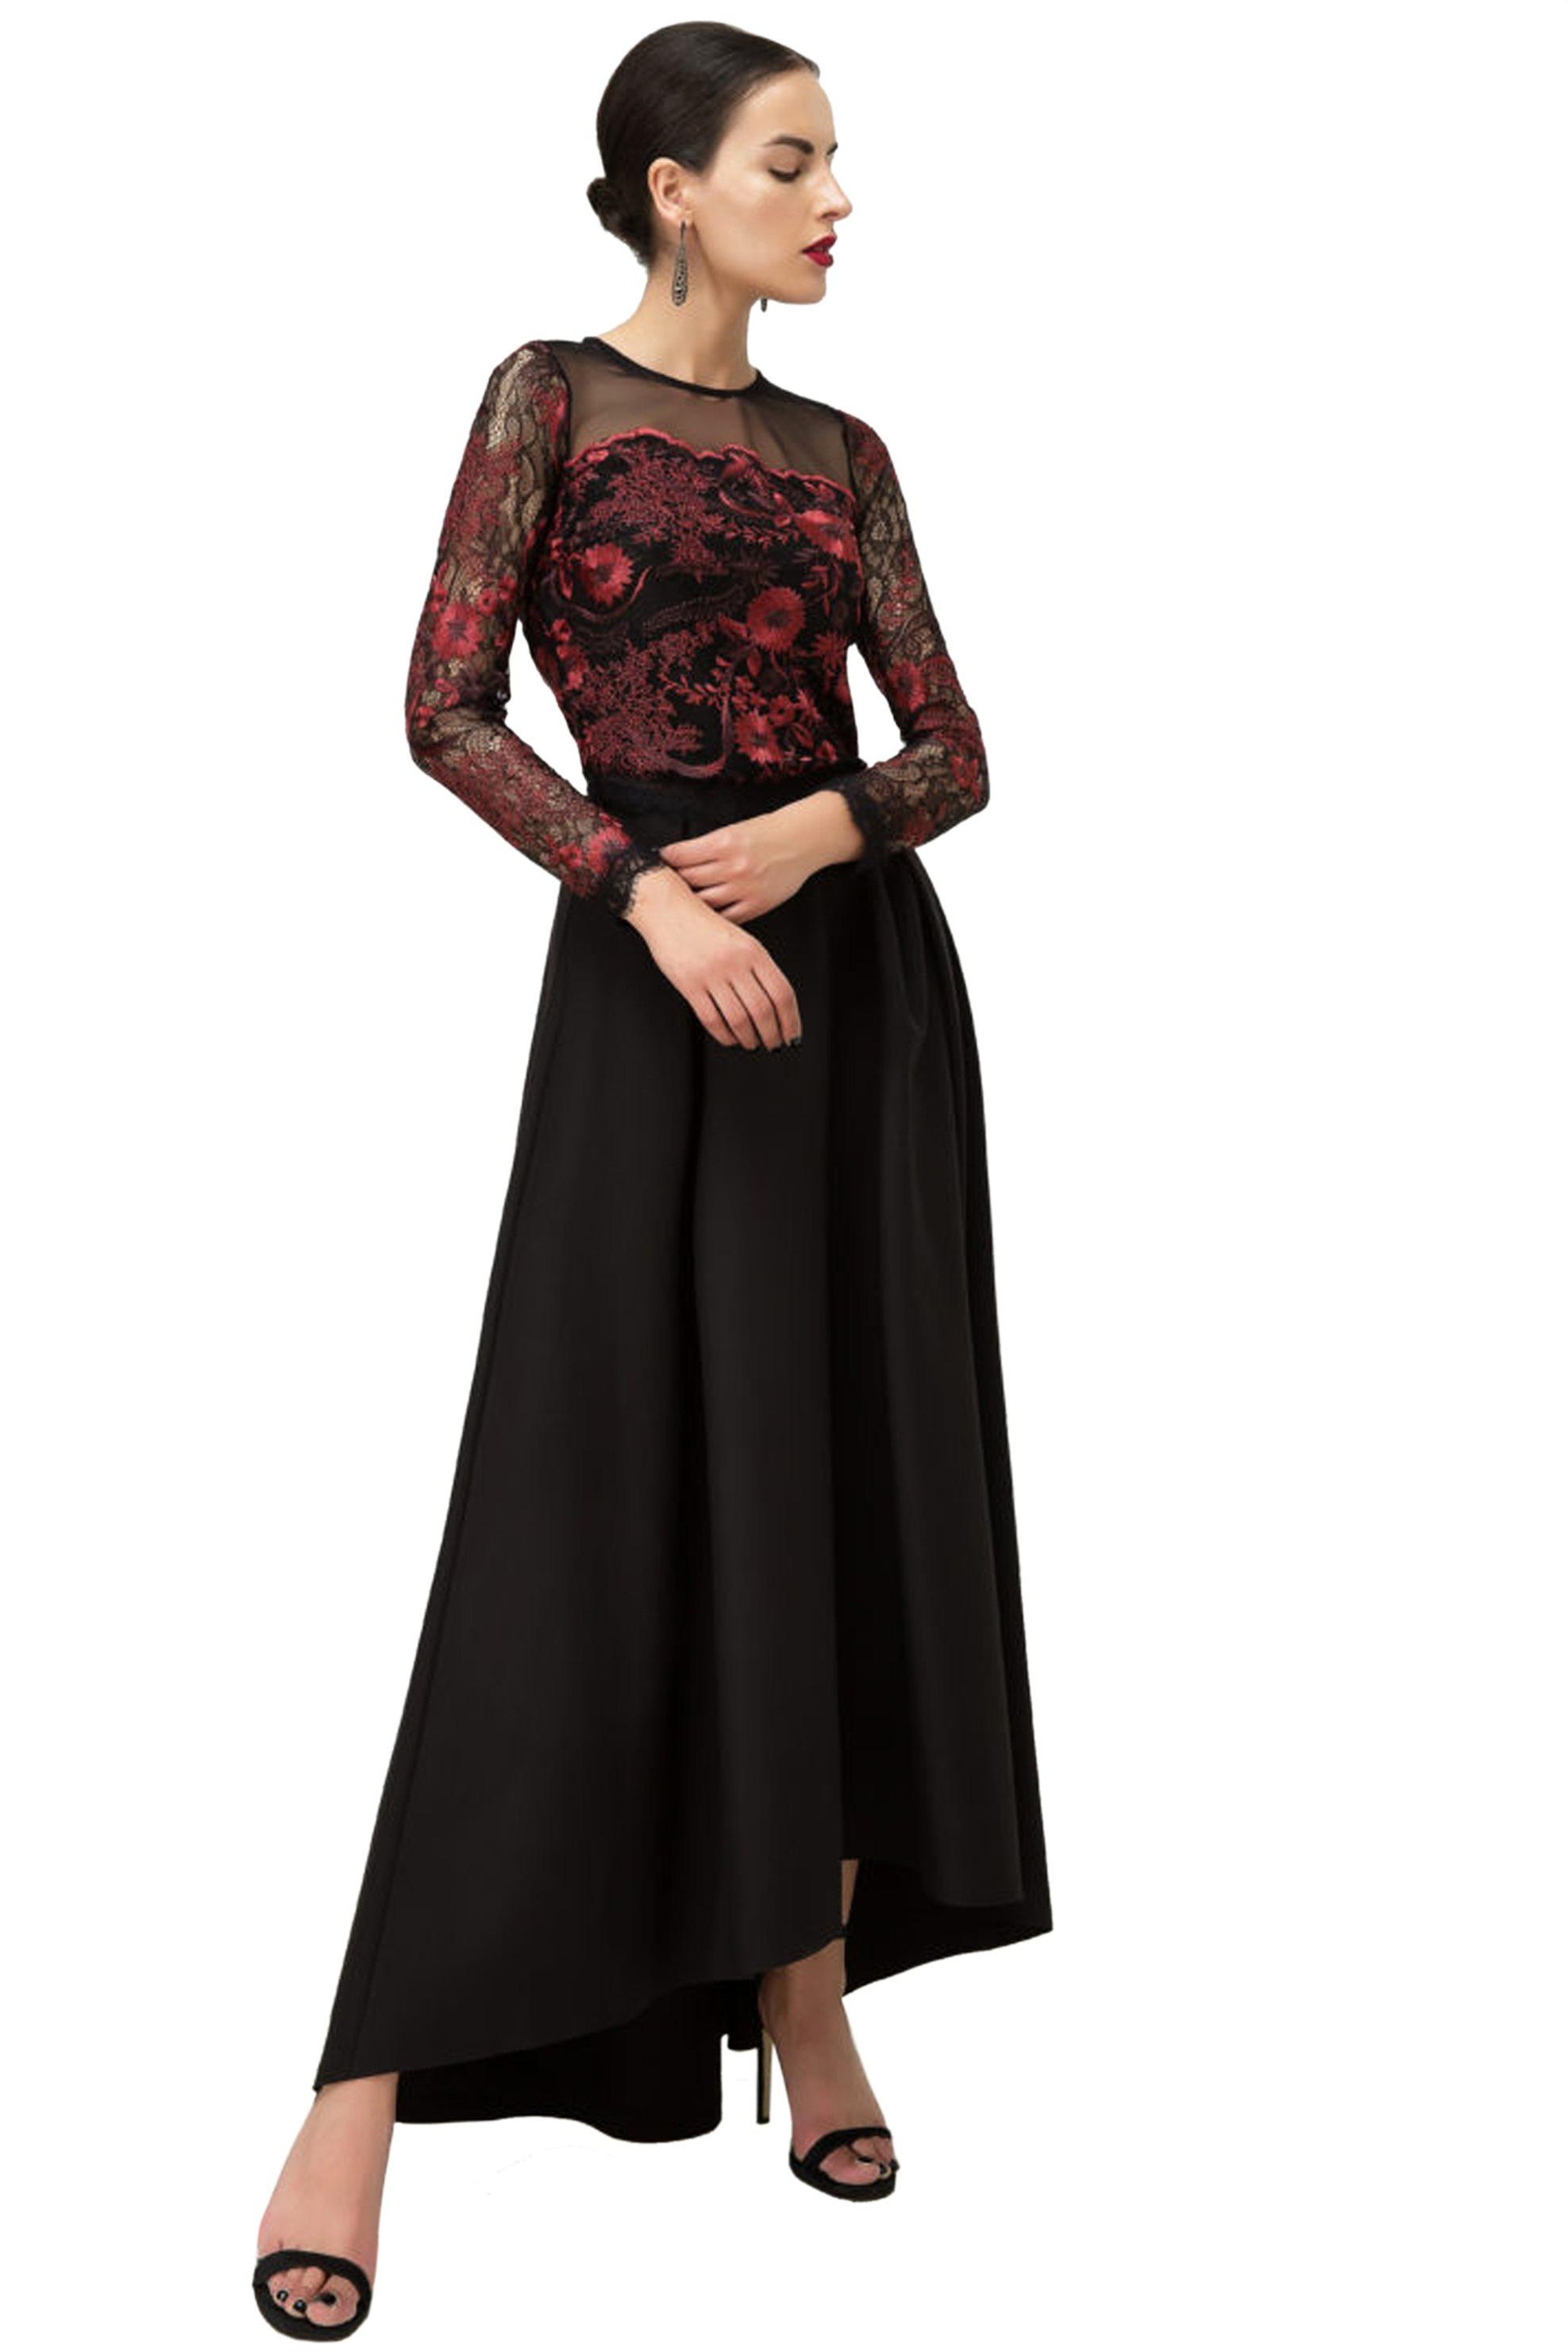 Billy Sabbado γυναικεία μπλούζα από δαντέλα με διαφάνεια - 0100284543 - Μαύρο γυναικα   ρουχα   tops   μπλούζες   βραδυνές